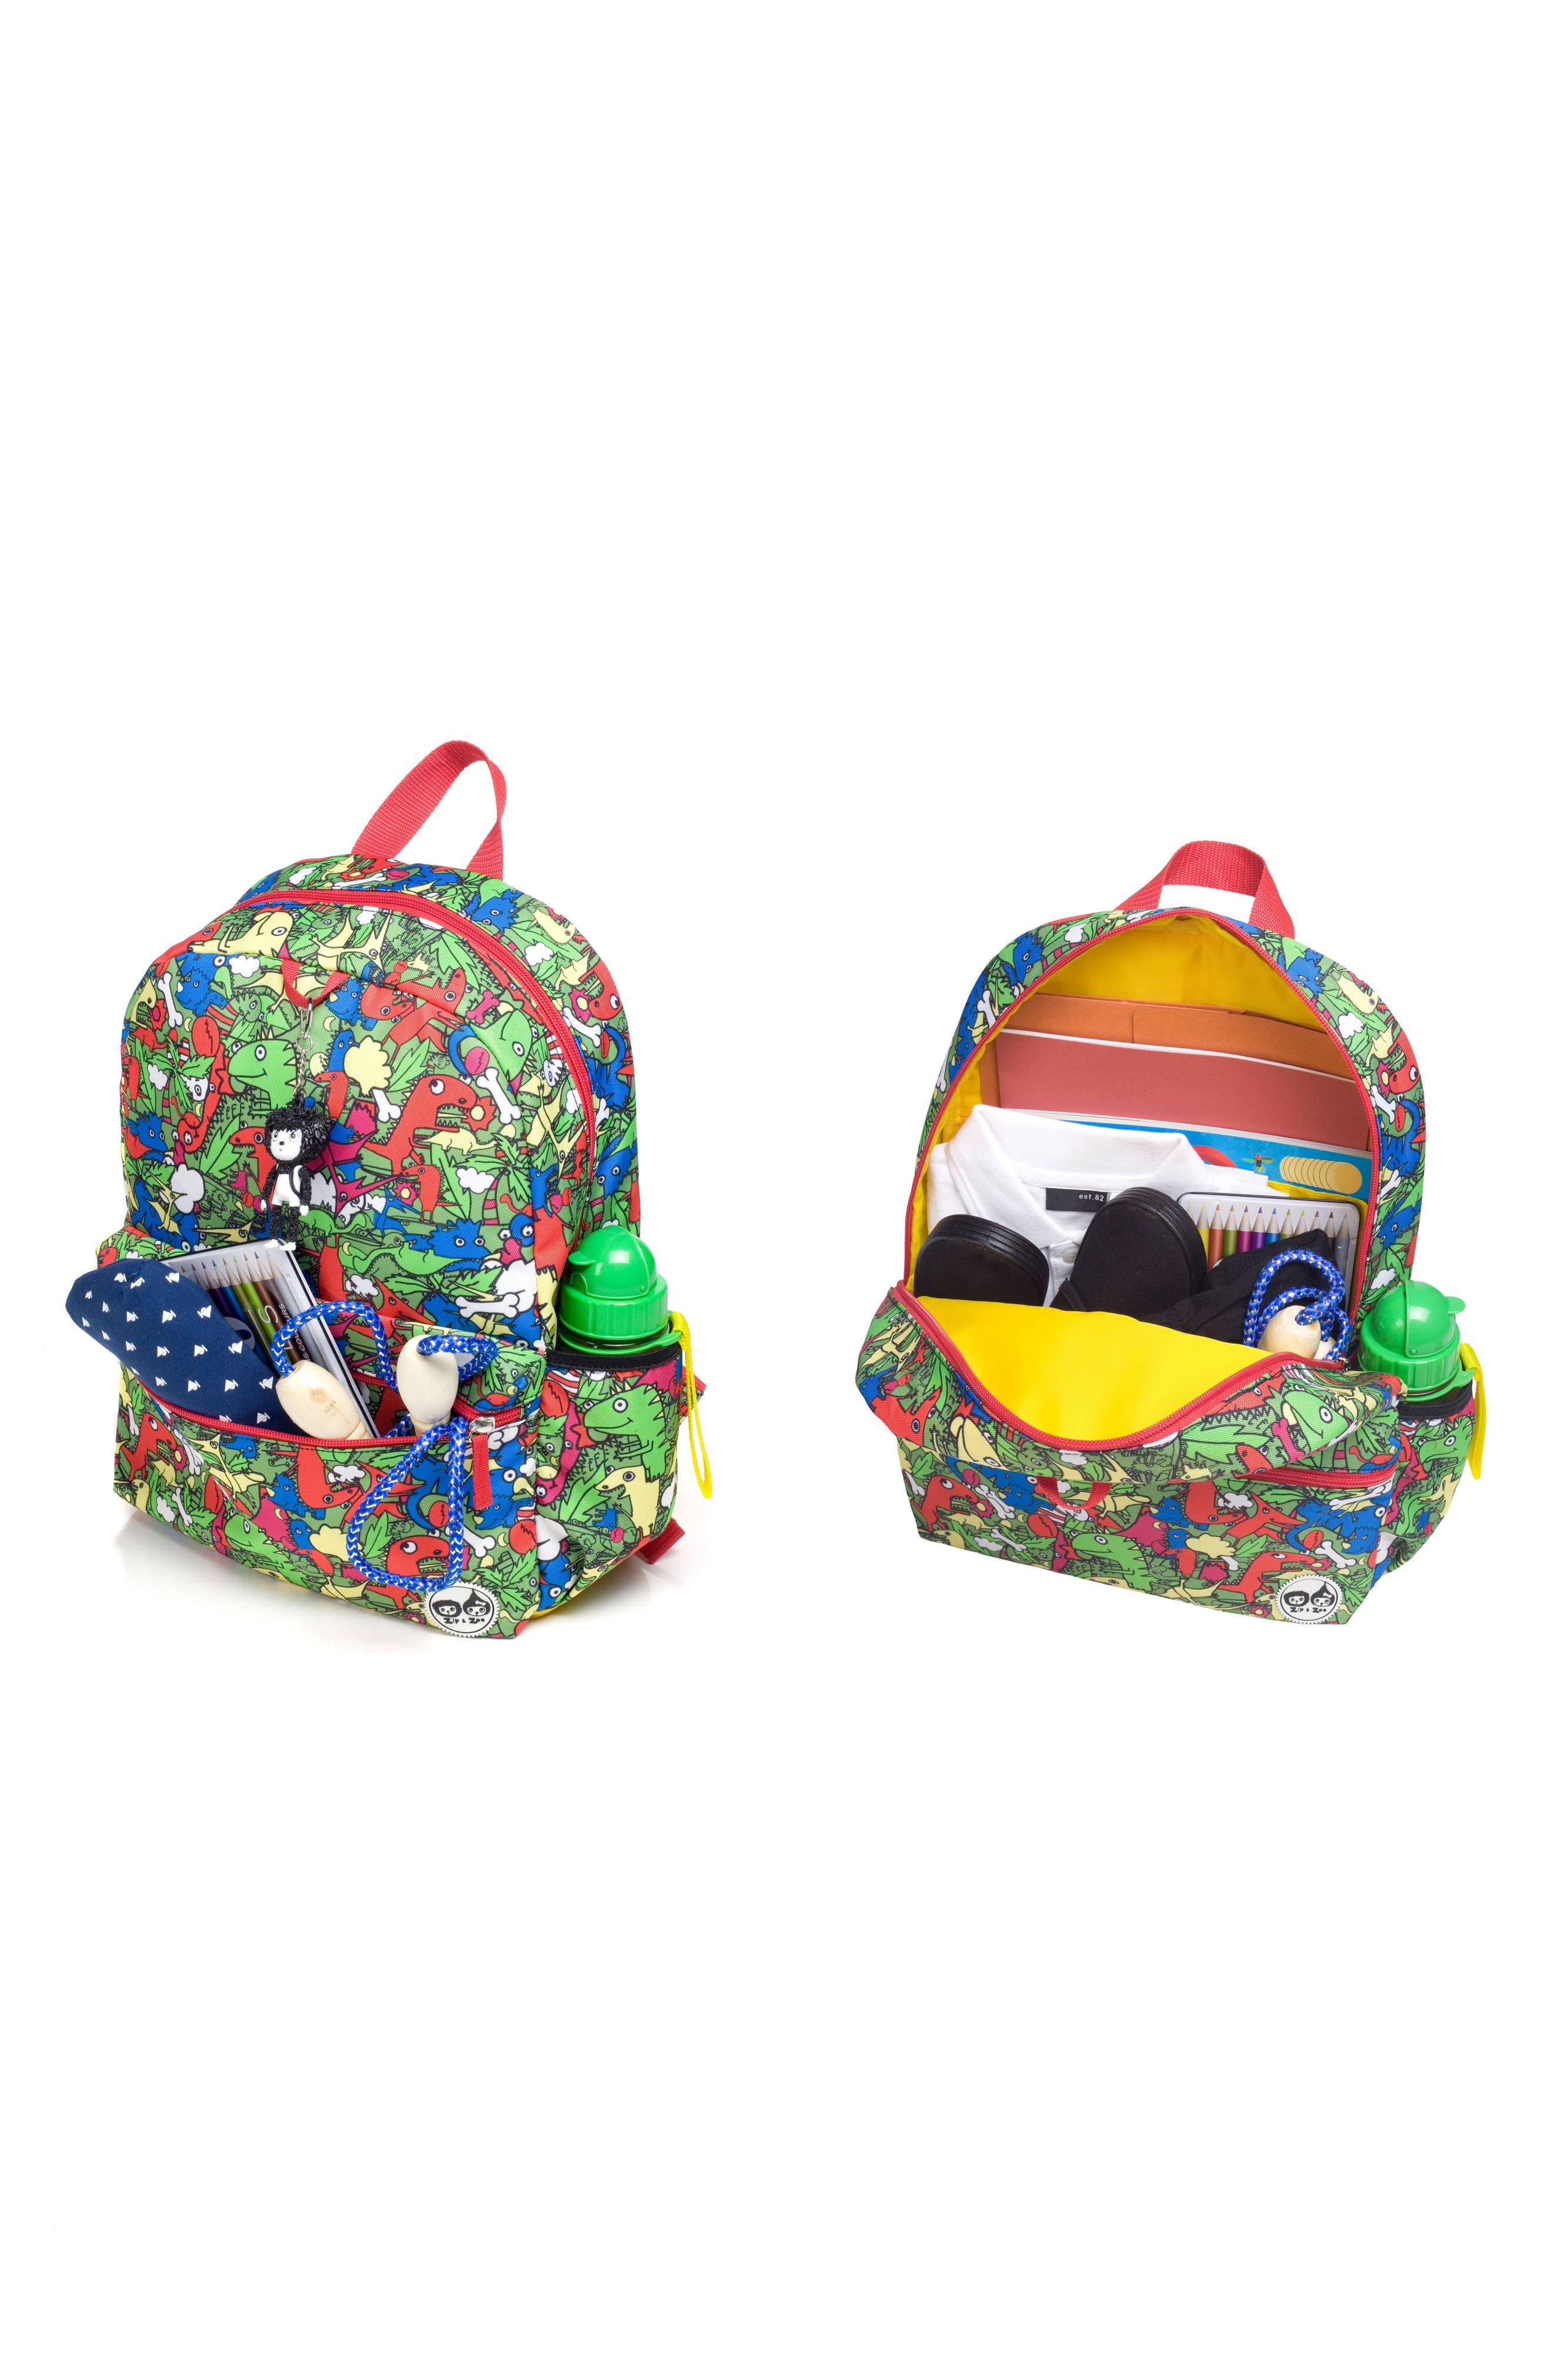 Zip & Zoe Junior Backpack Set,                             Alternate thumbnail 7, color,                             300